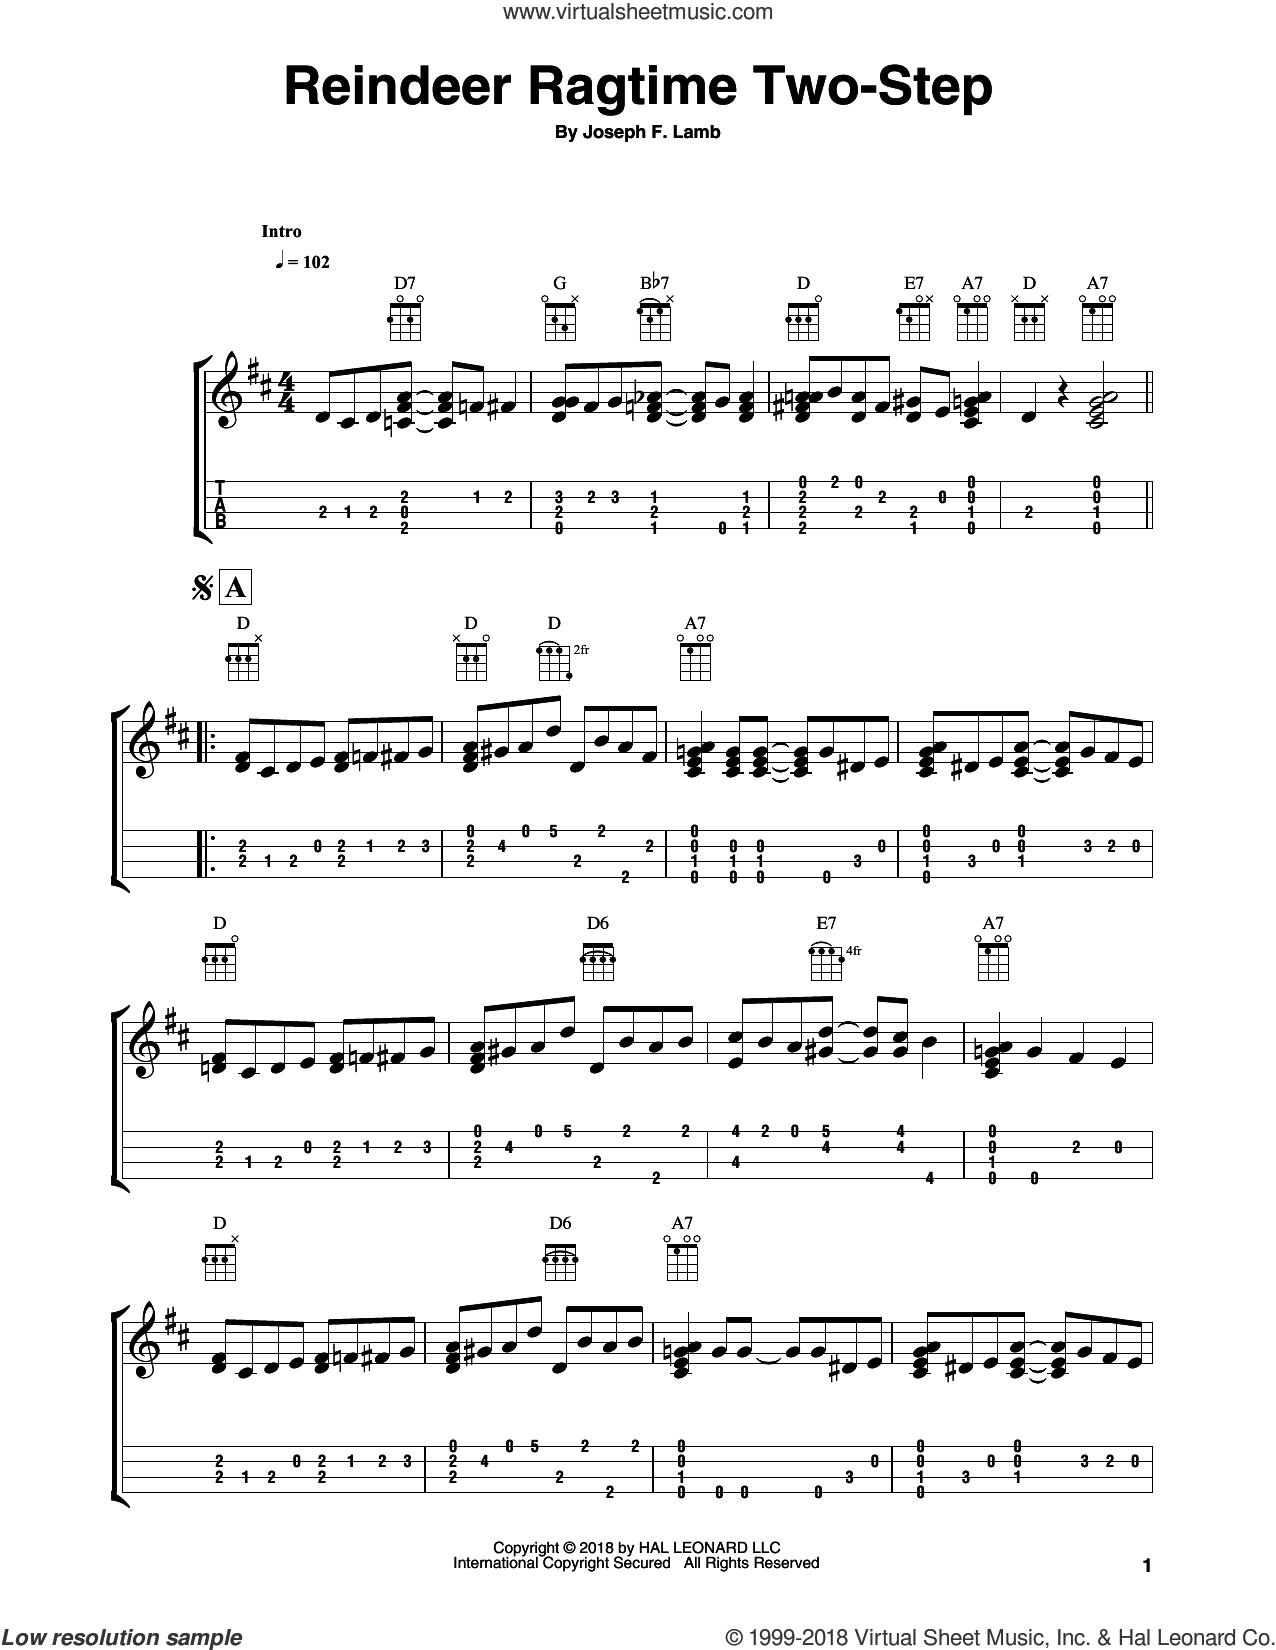 Reindeer Ragtime Two-Step sheet music for ukulele (easy tablature) (ukulele easy tab) by Joseph Lamb and Fred Sokolow, intermediate skill level